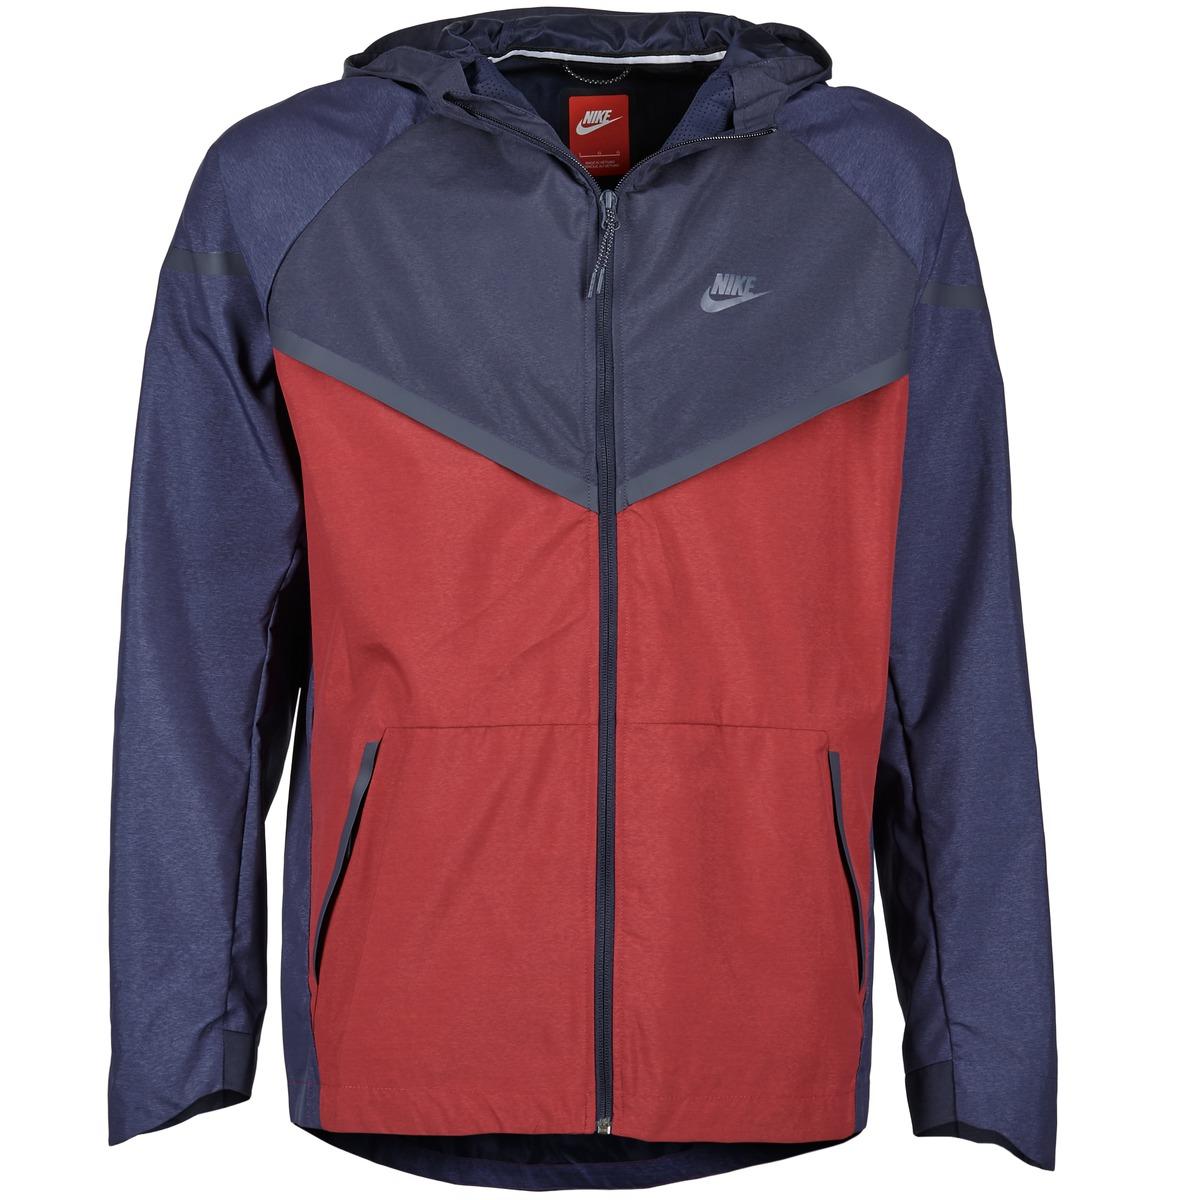 Nike TECH WINDRUNNER Rouge / Marine / Gris